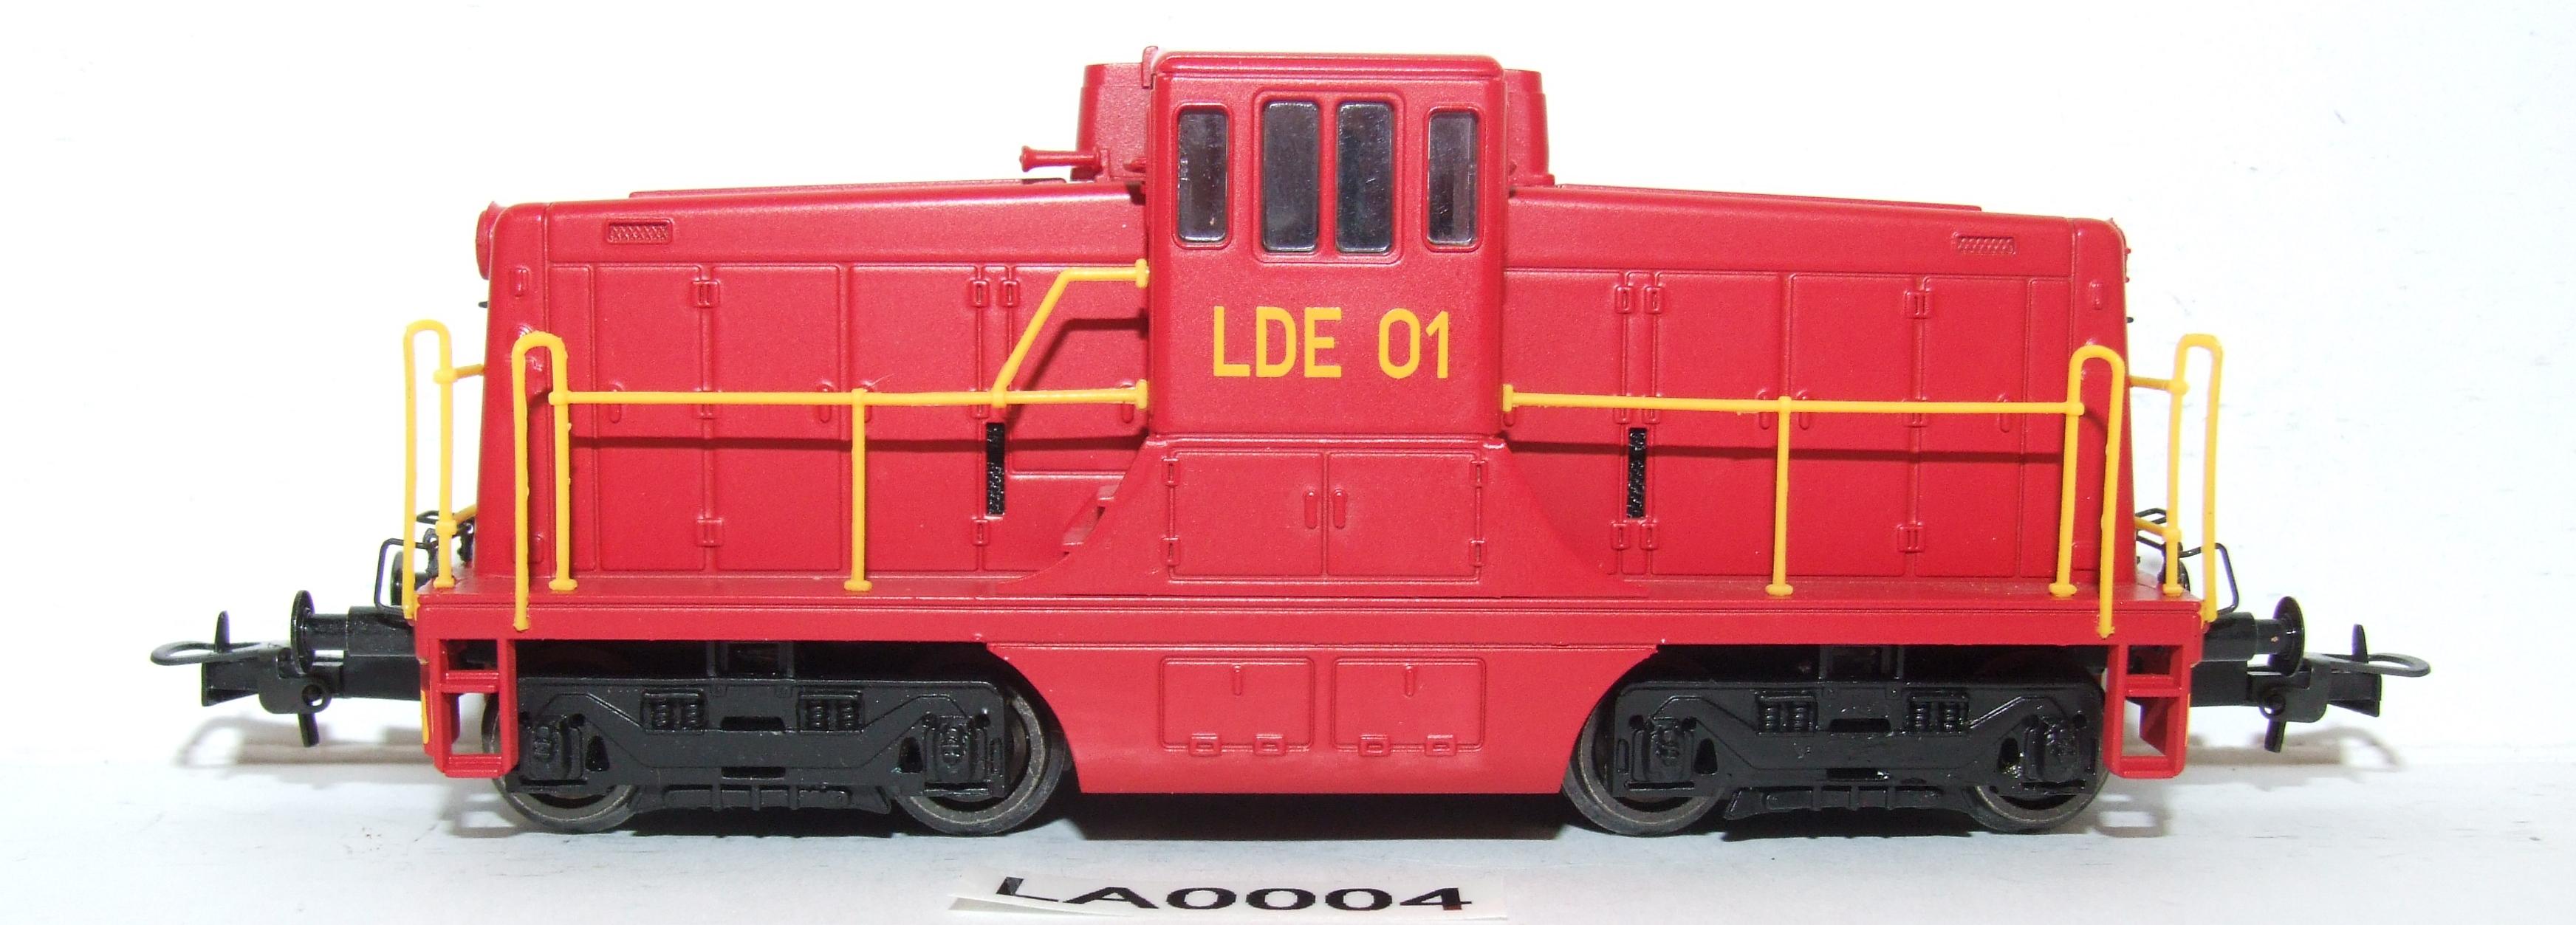 LA0004 Liliput H0 L 104407 Diesellok FS Concessione Loco Diesel DC